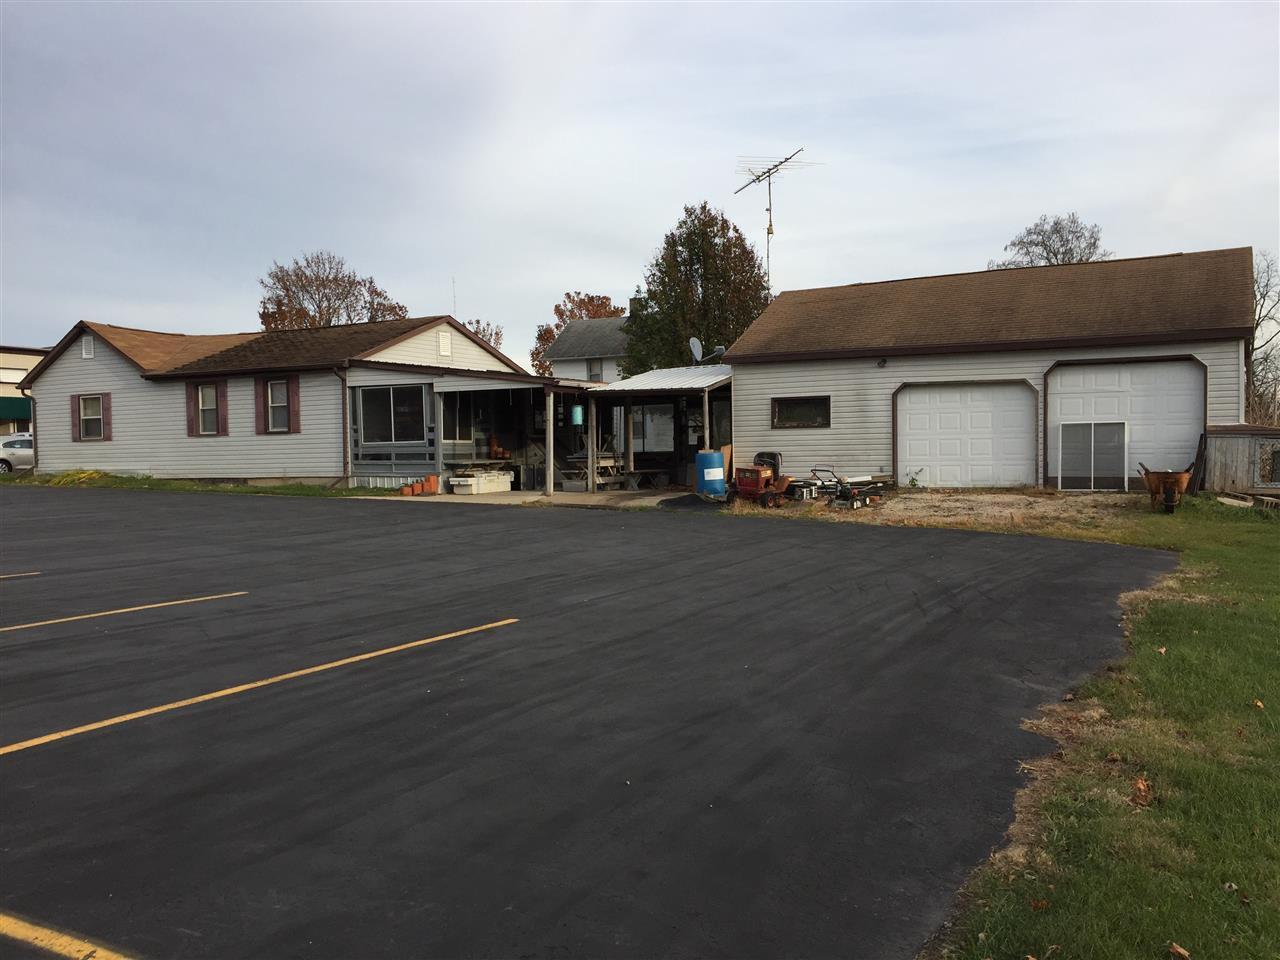 39 W Main St, Benton, WI 53803